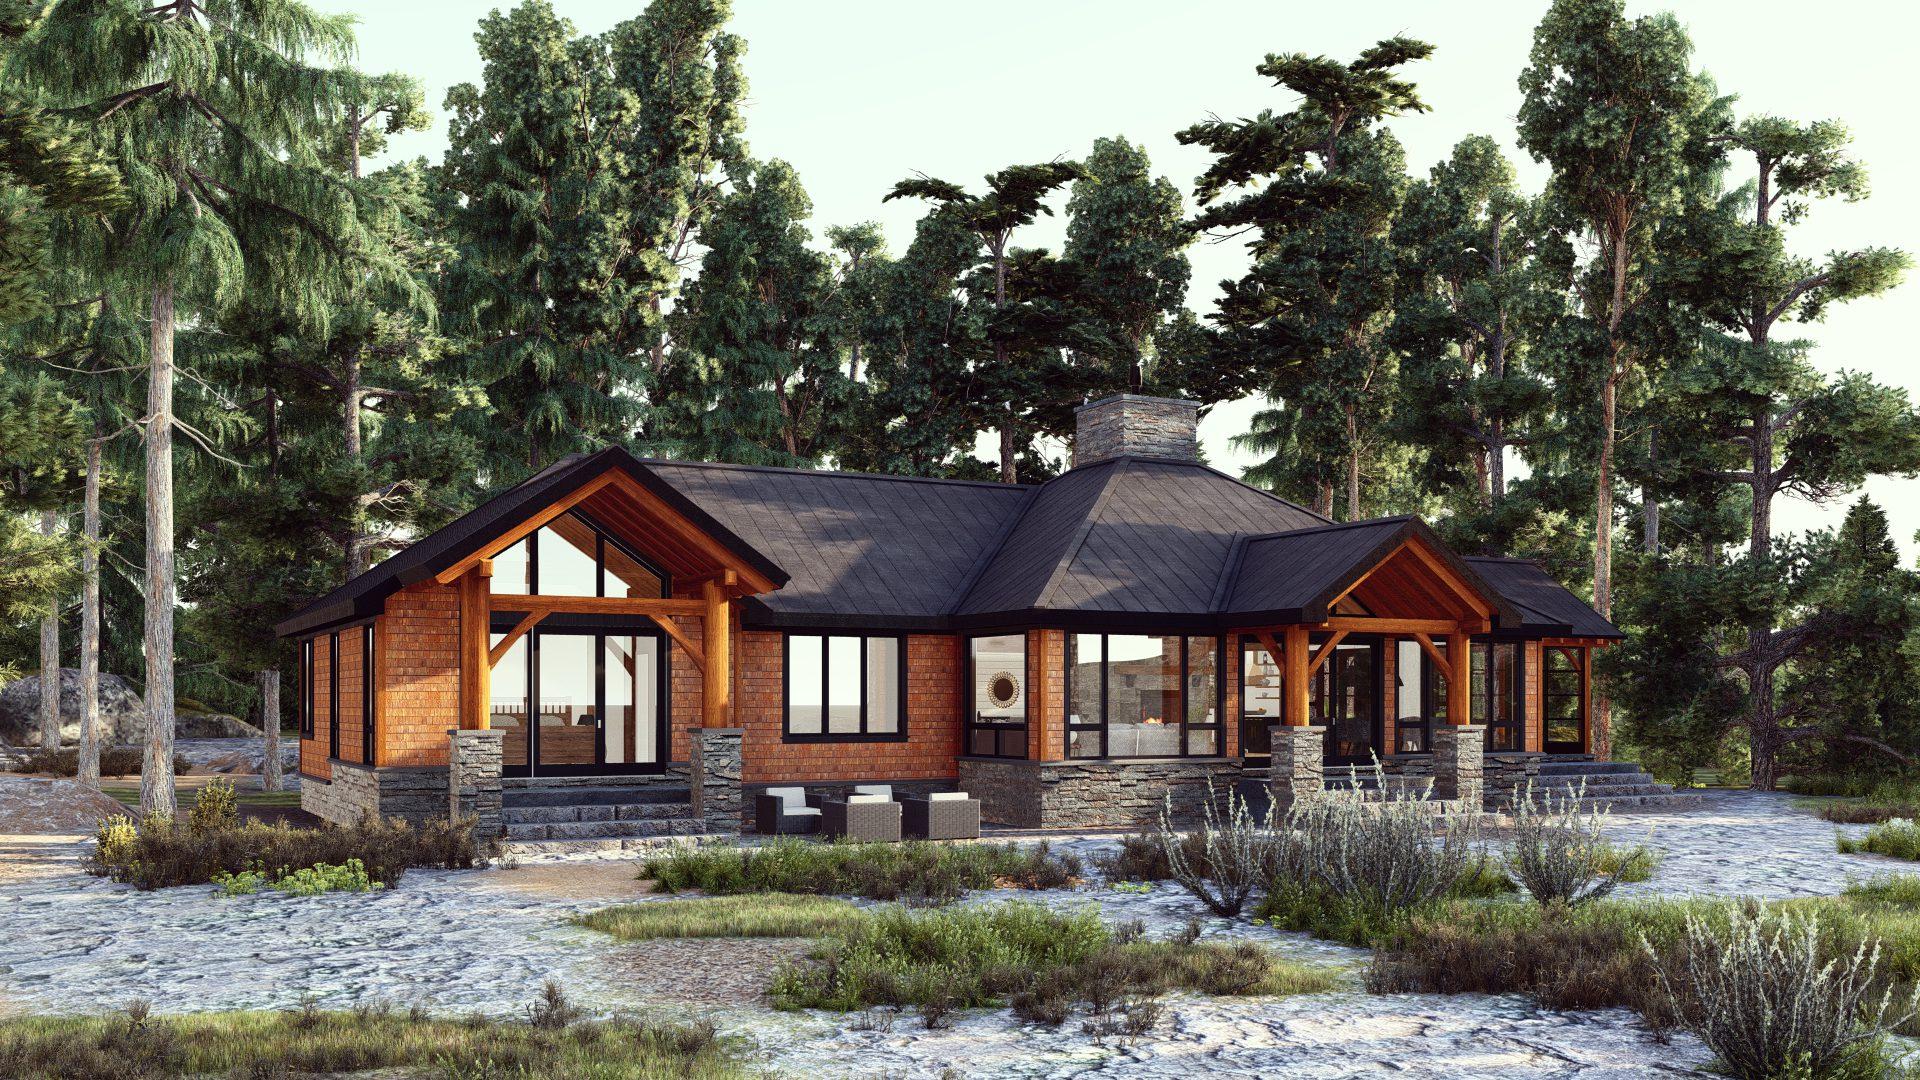 Normerica Timber Frames, House Plan, The Britt 3954, Exterior, Back